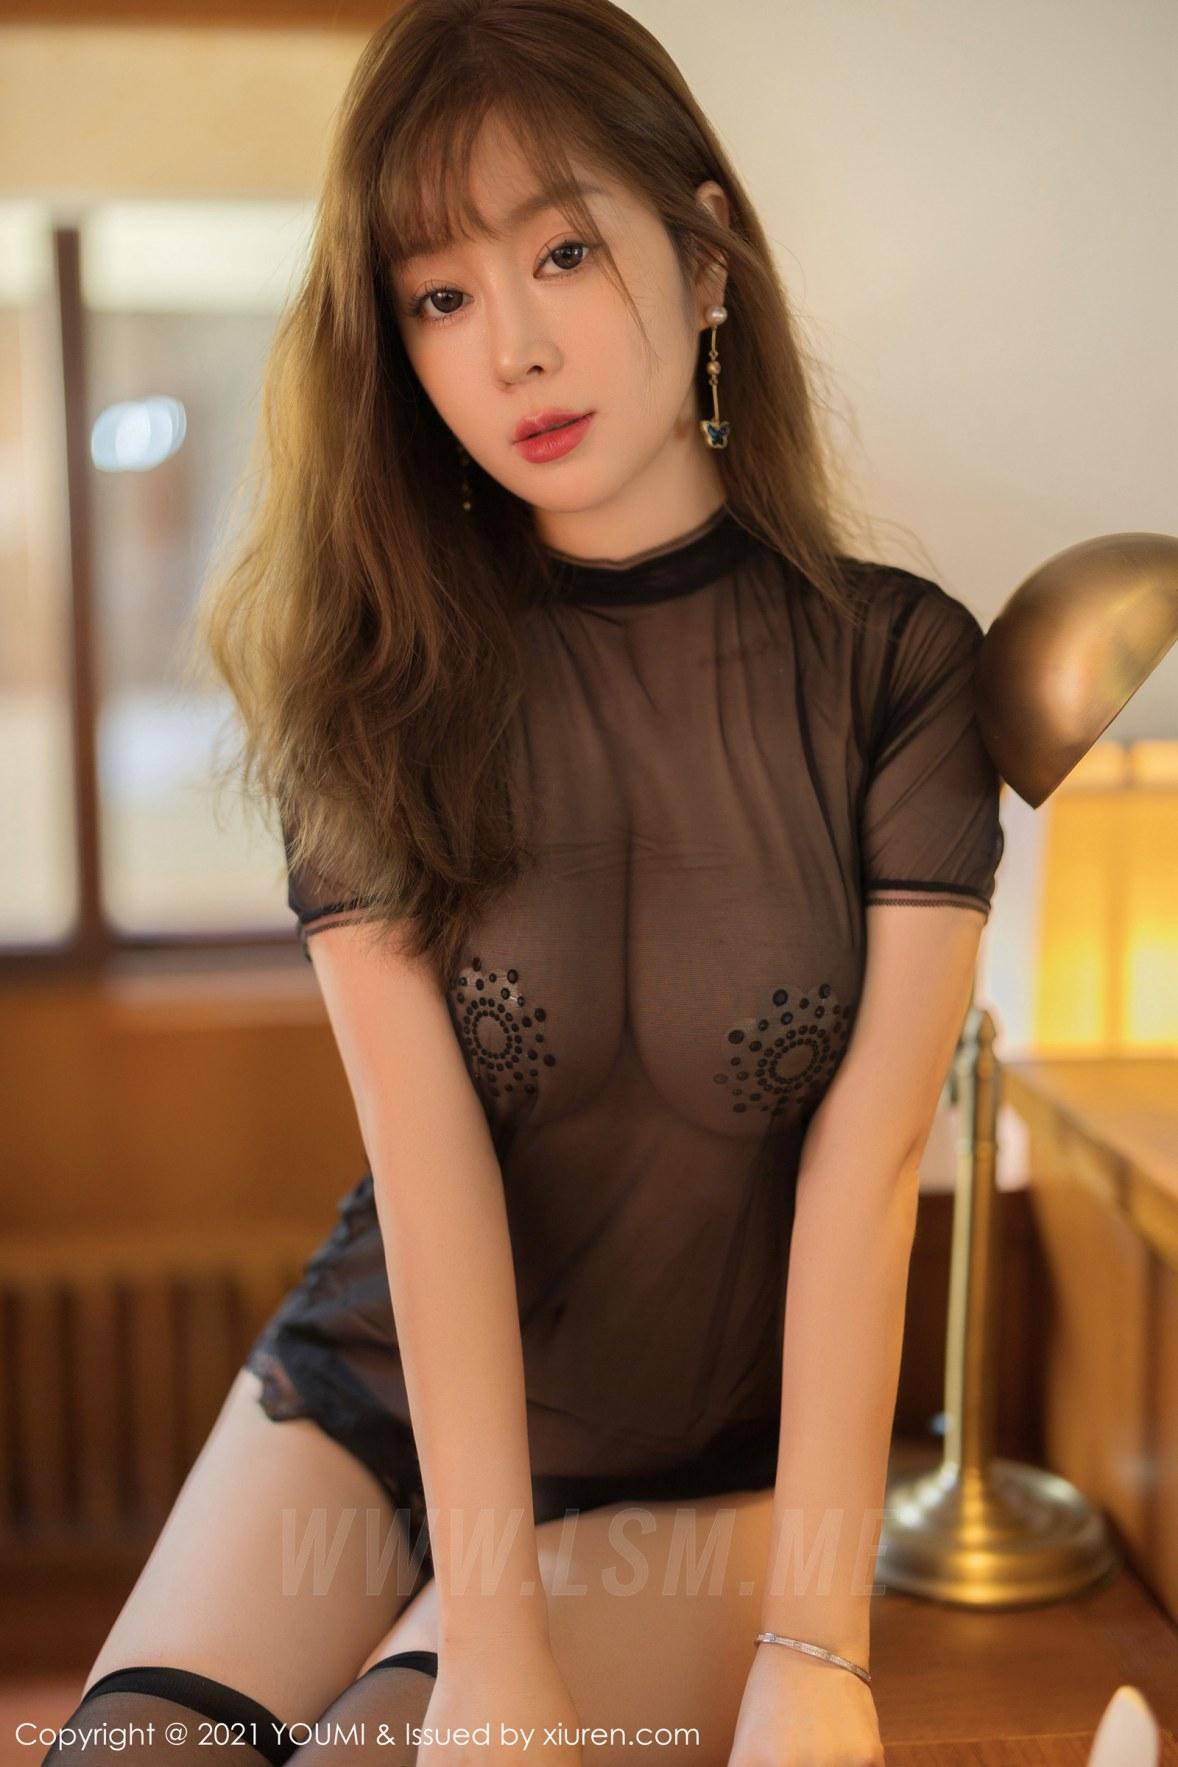 YOUMI 尤蜜荟 Vol.674  情趣魅惑 王雨纯 西双版纳旅拍22 - 4